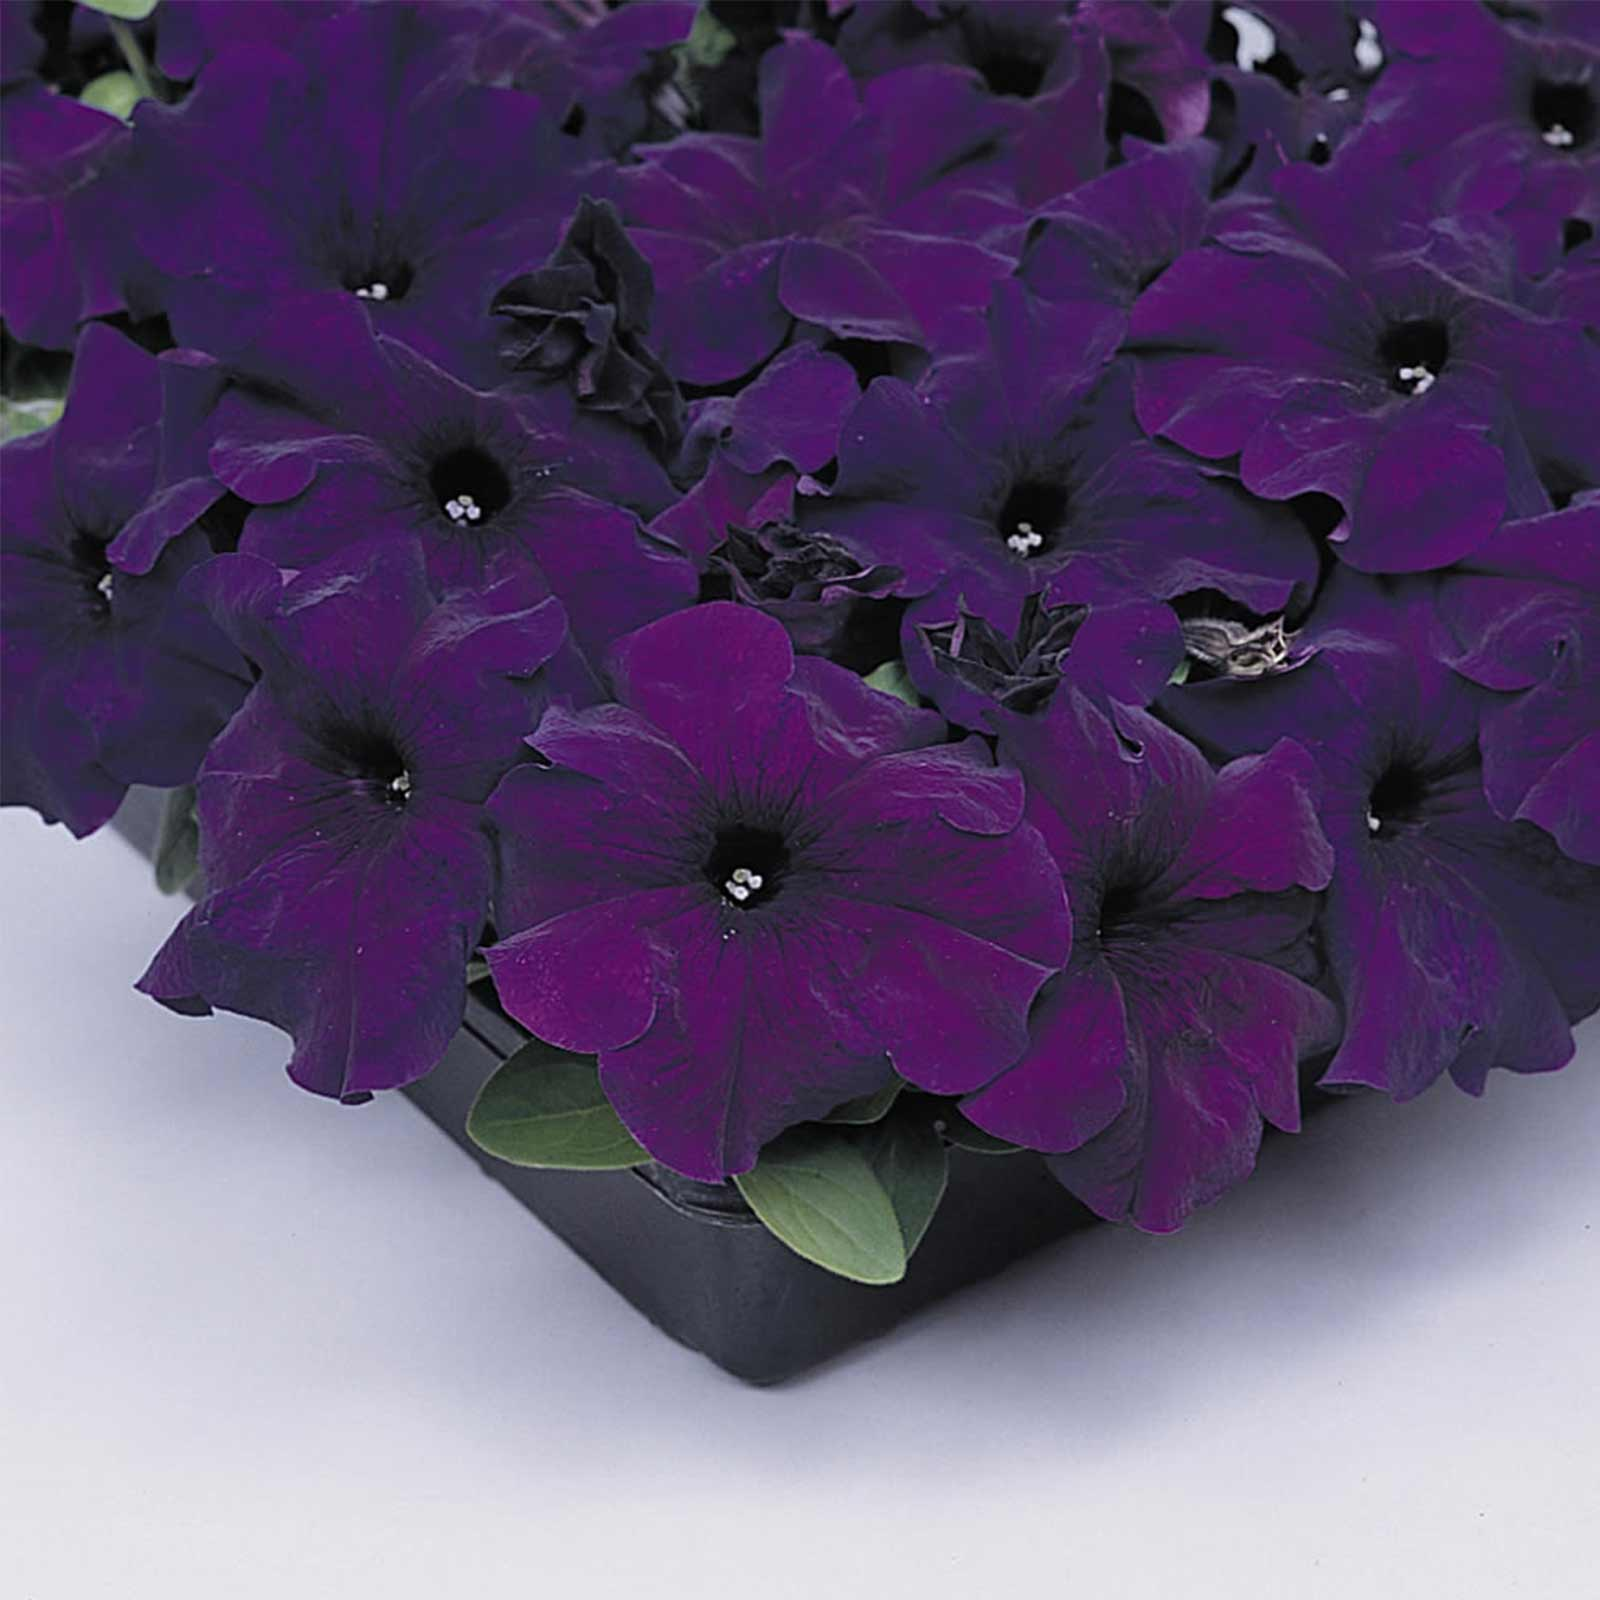 Petunia - Supercascade Series Flower Garden Seed - 1000 Pelleted Seeds - Blush Color Blooms - Annual Flowers - Single Grandiflora Petunias